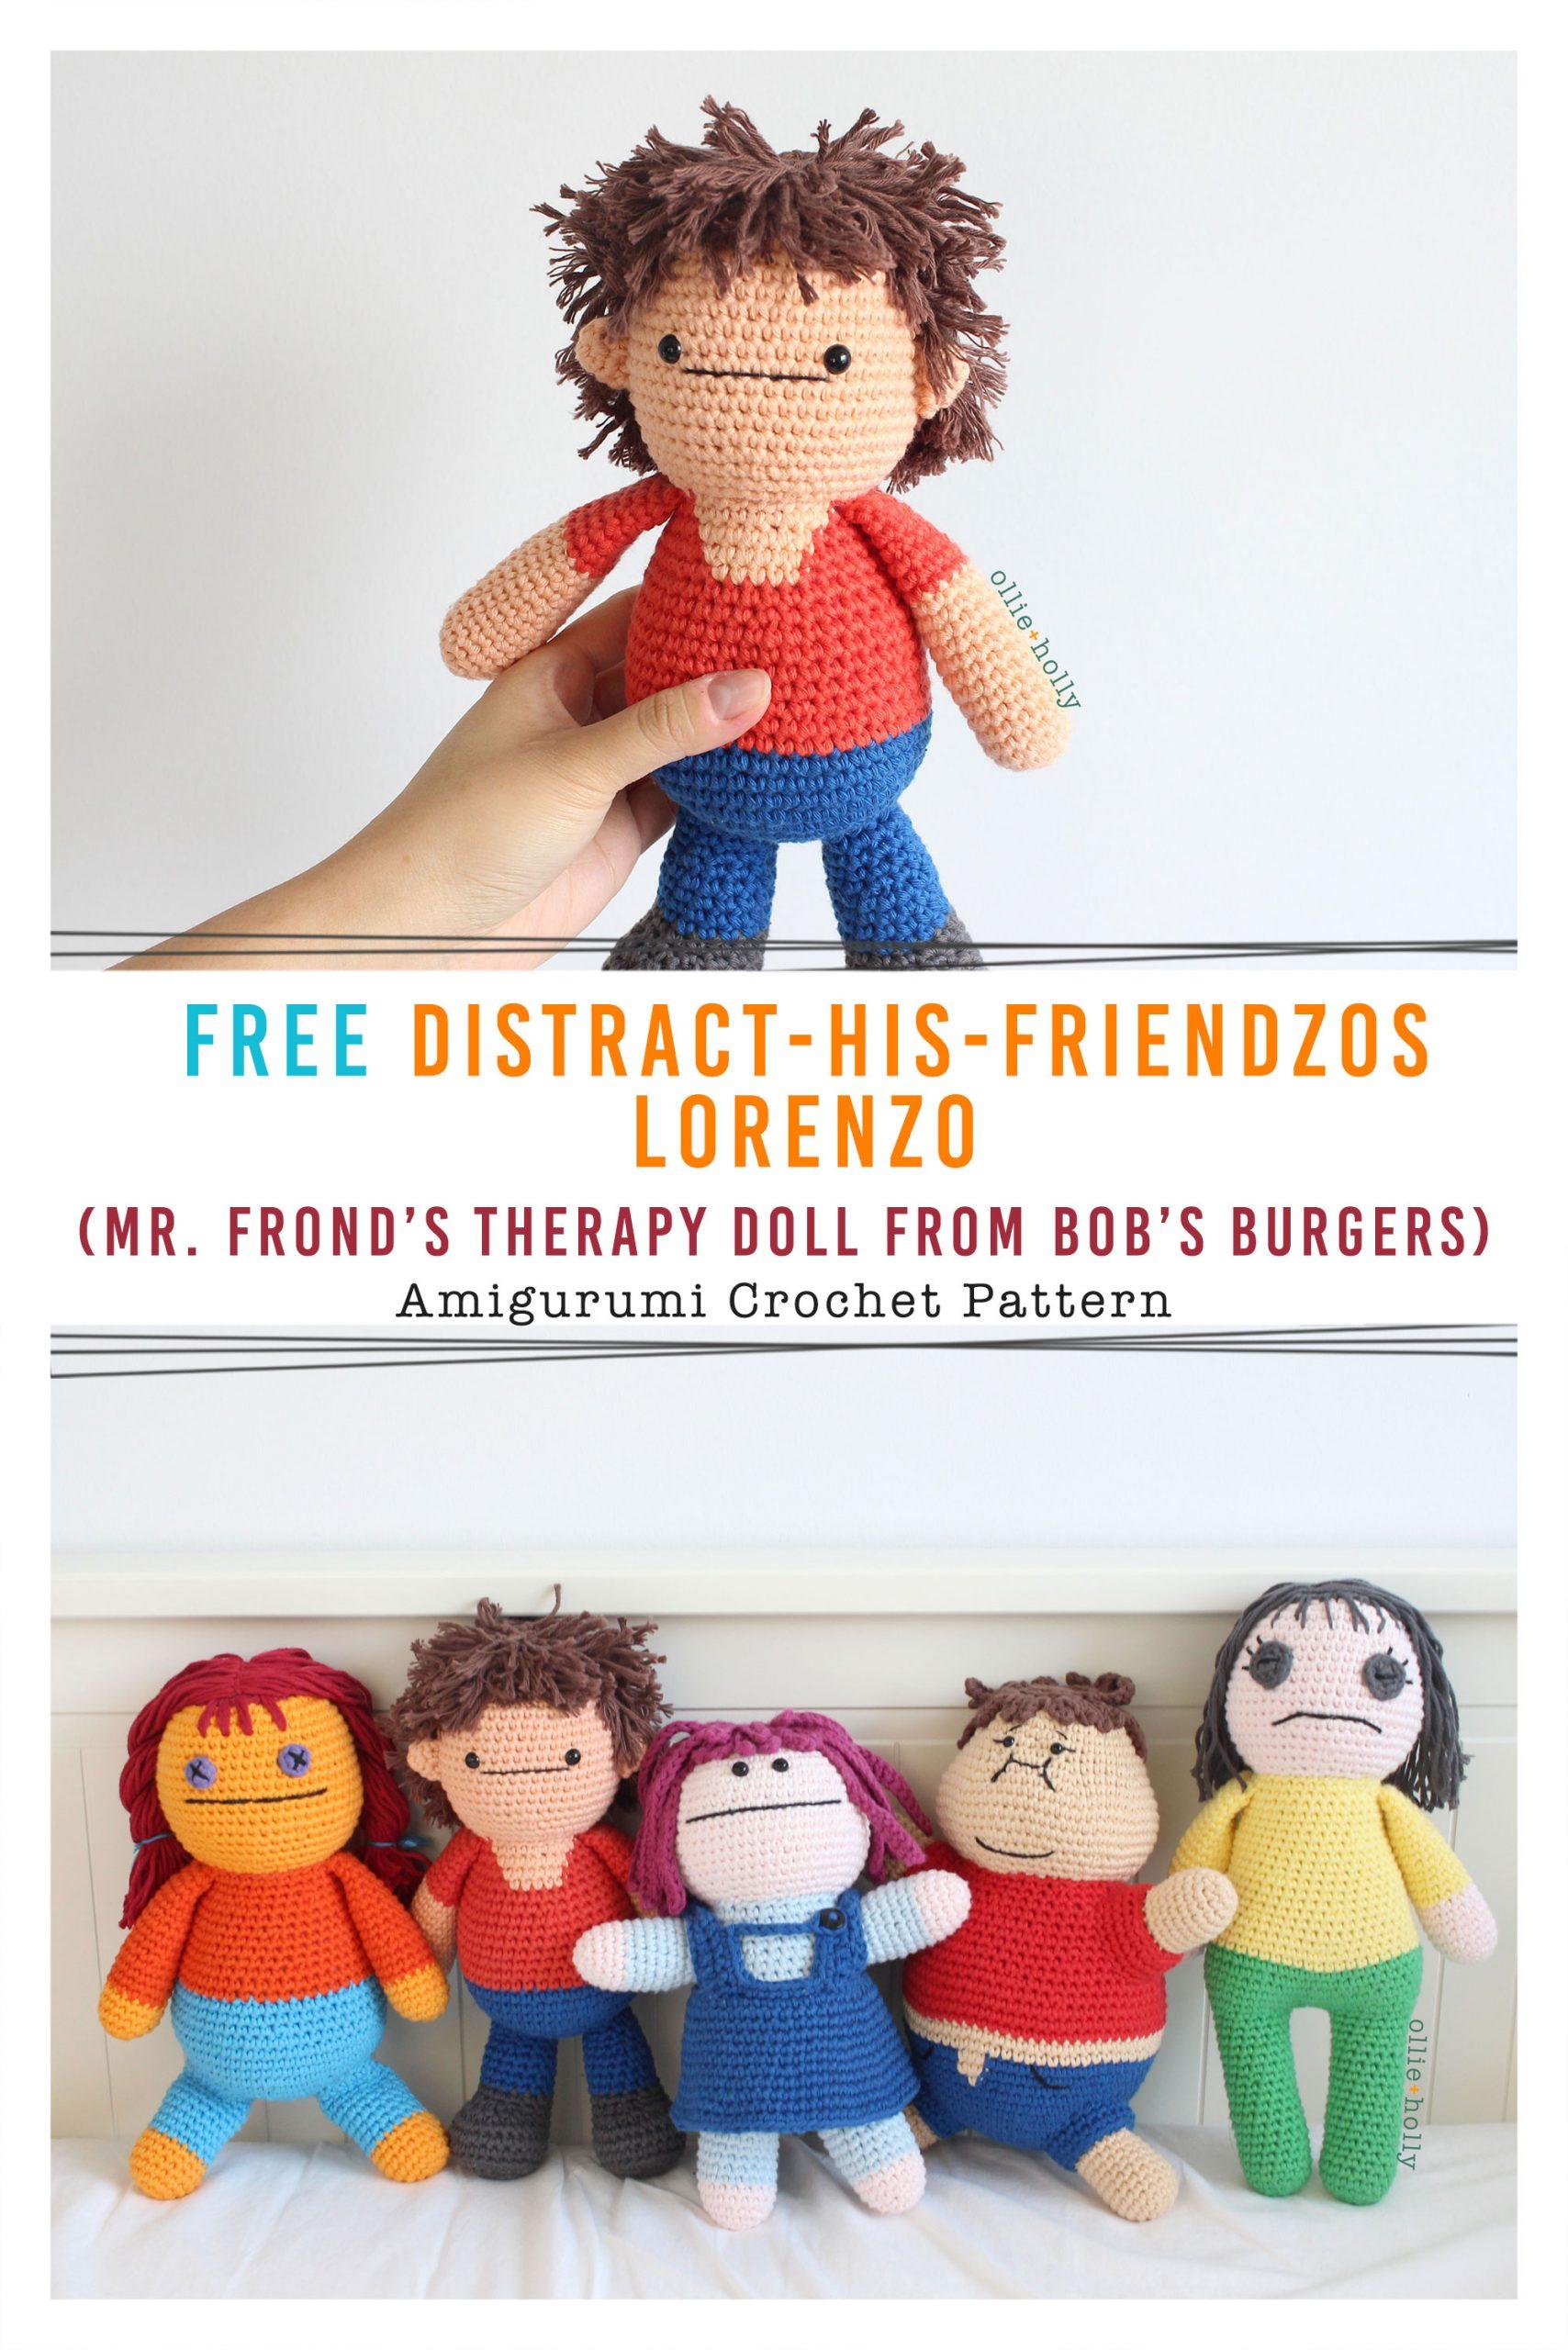 Free Distracts-his-friendzo Lorenzo (Mr. Frond's Therapy Dolls from Bob's Burgers) Amigurumi Crochet Pattern Pinterest